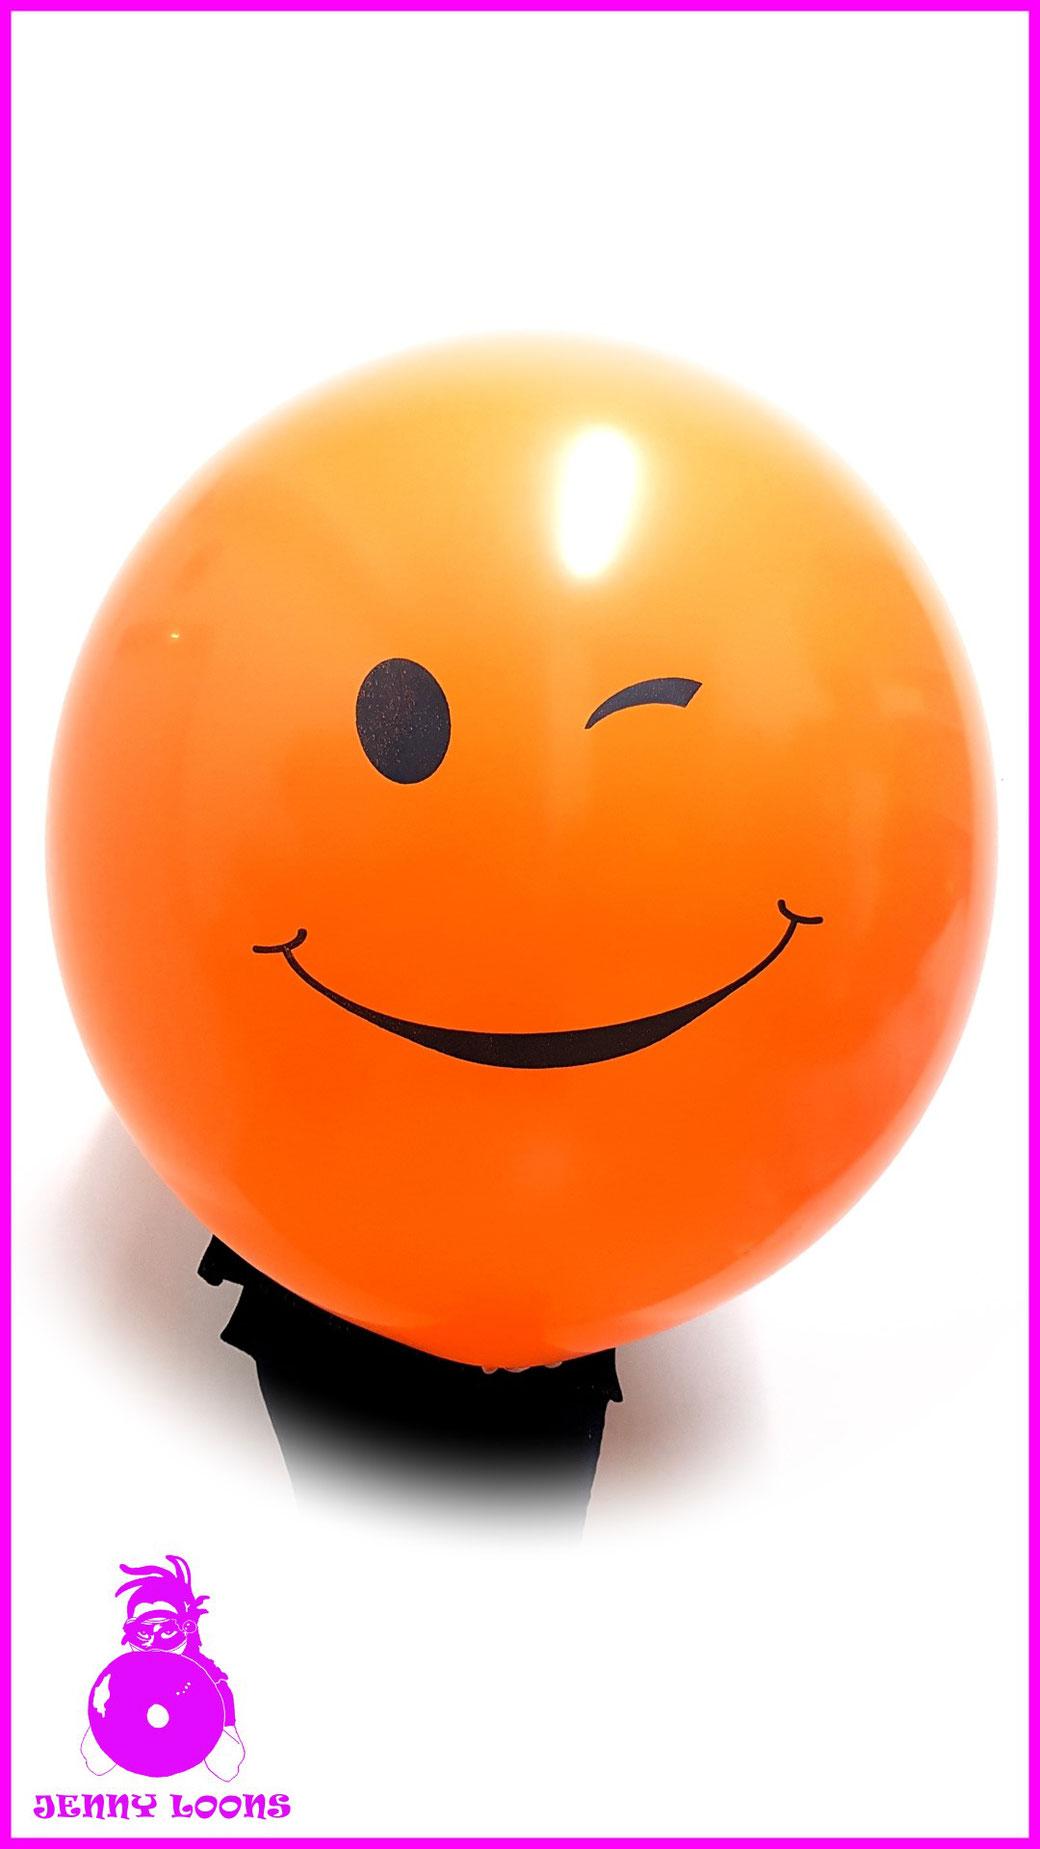 "TUFTEX TUF-TEX 36"" 90cm Riesenballons Smily Smiley Face Lchelndes Gesicht Ballon"